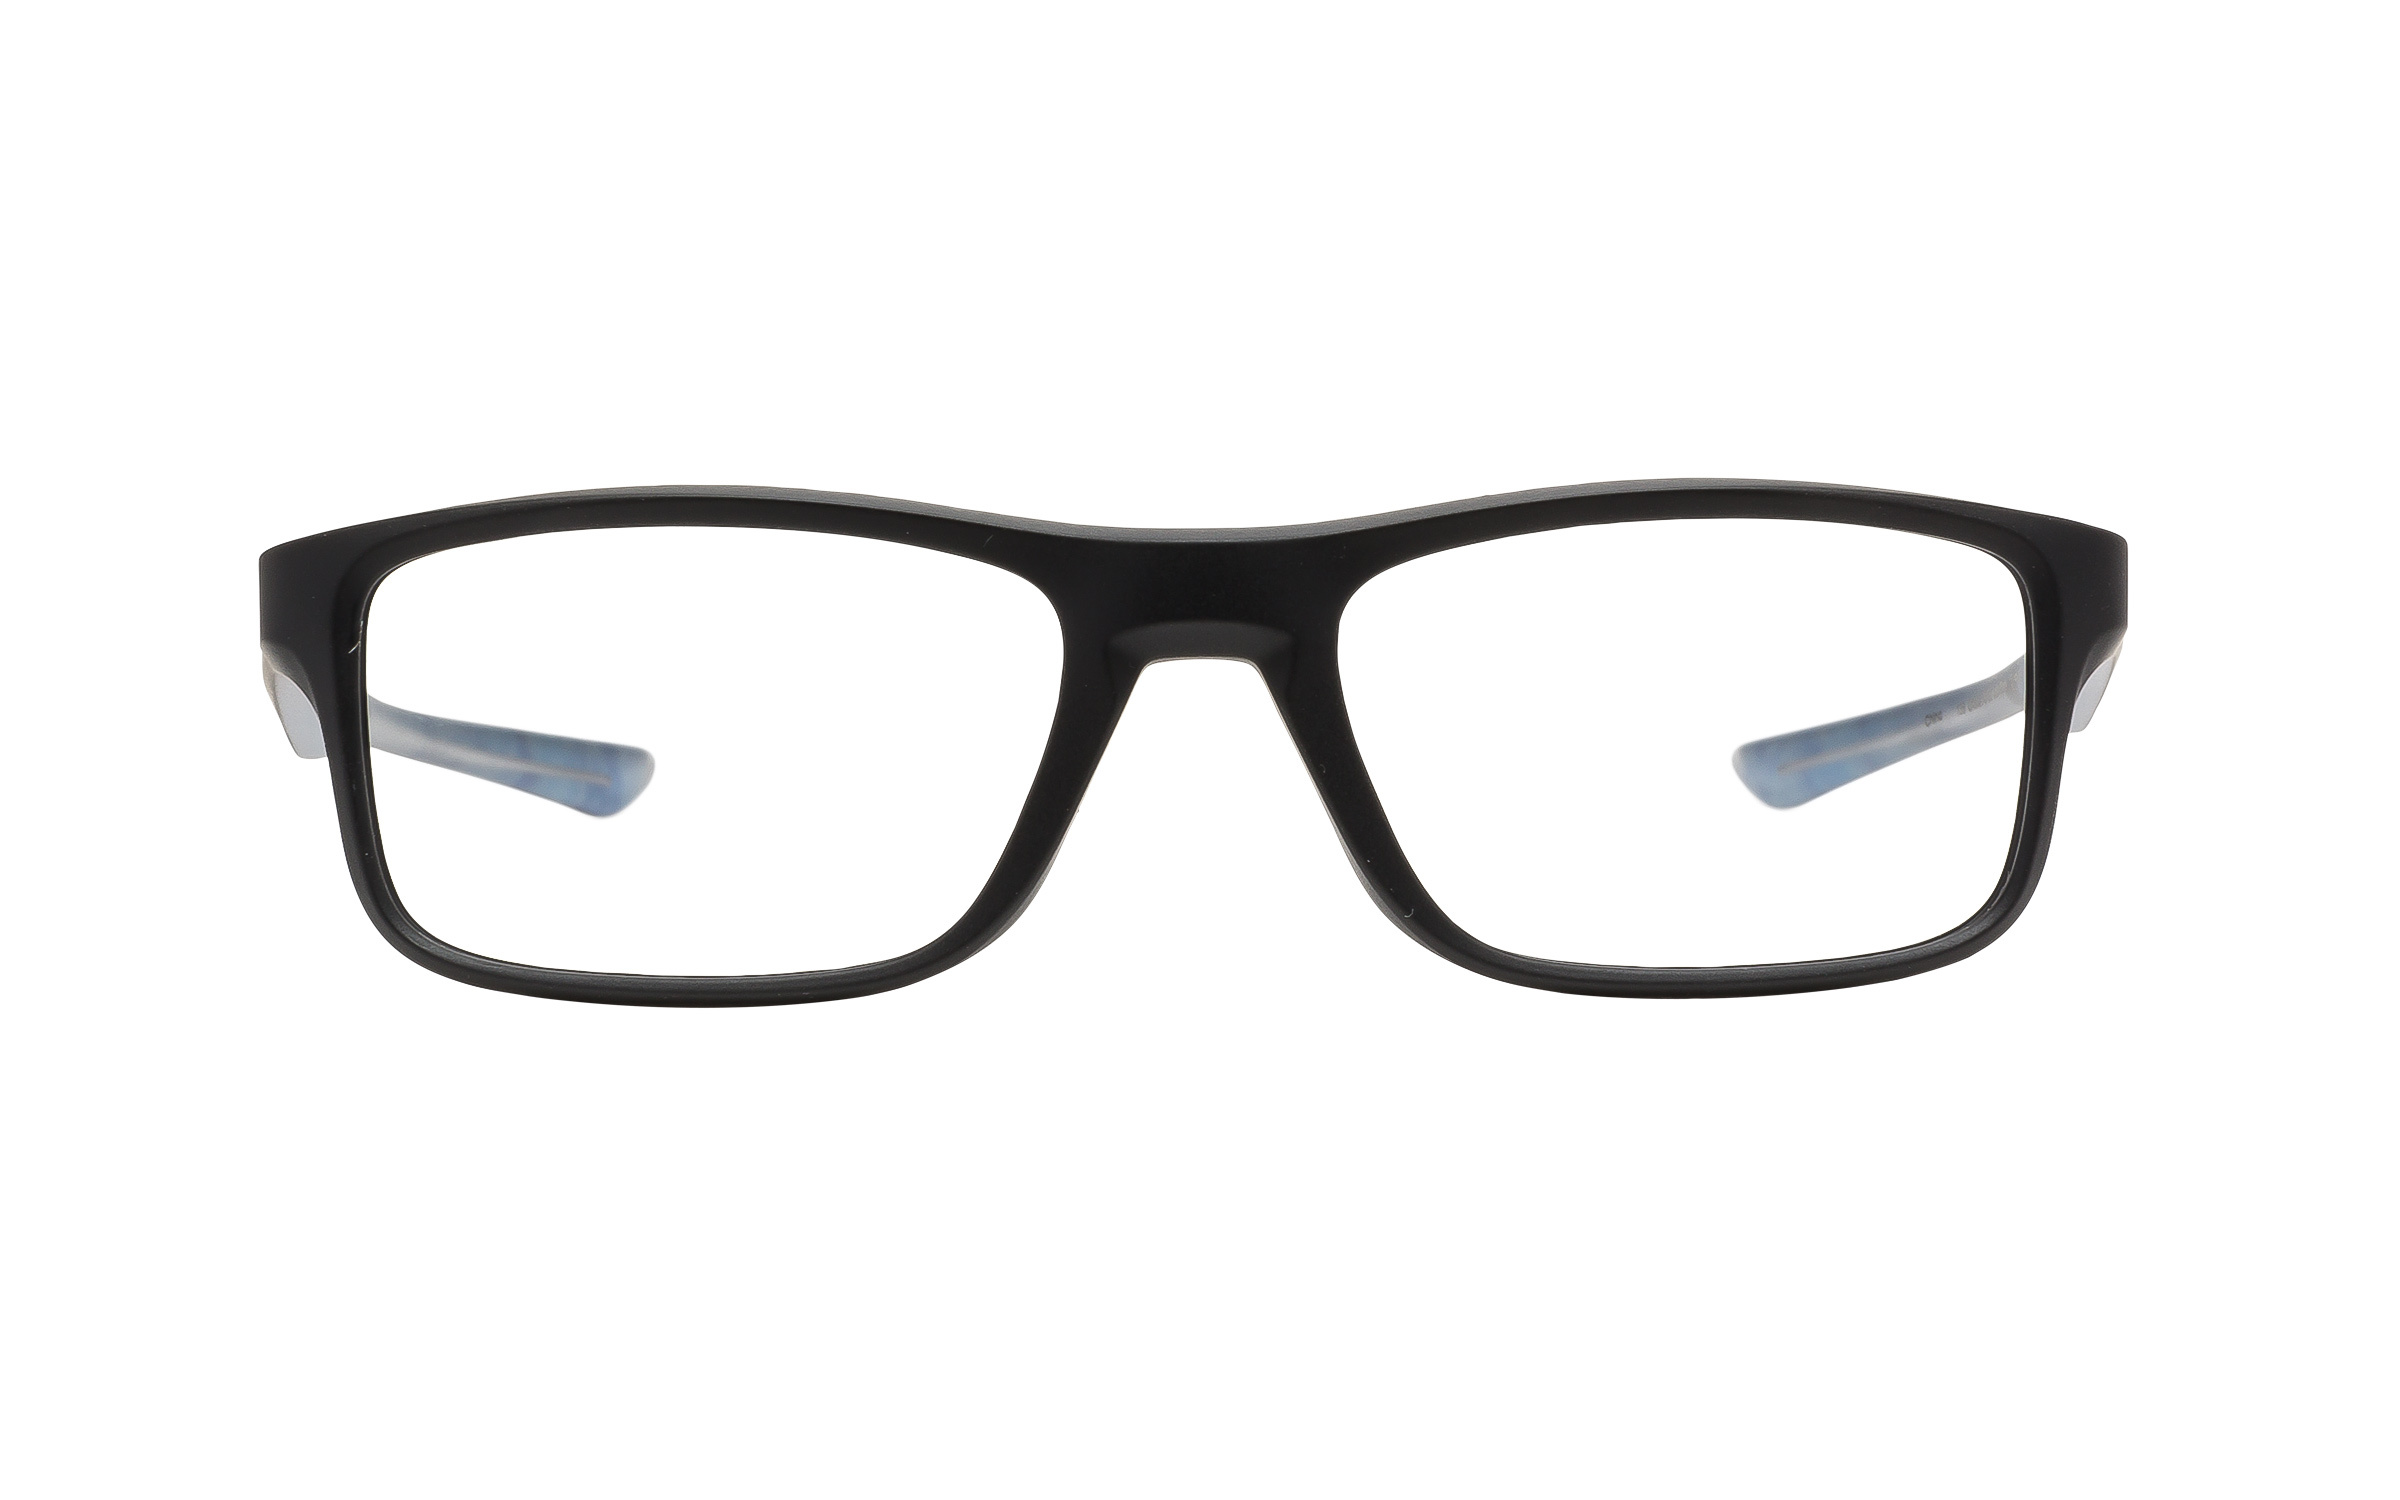 Oakley Plank 2.0 OX8081 01 Eyeglasses and Frame in Satin Black | Acetate - Online Coastal